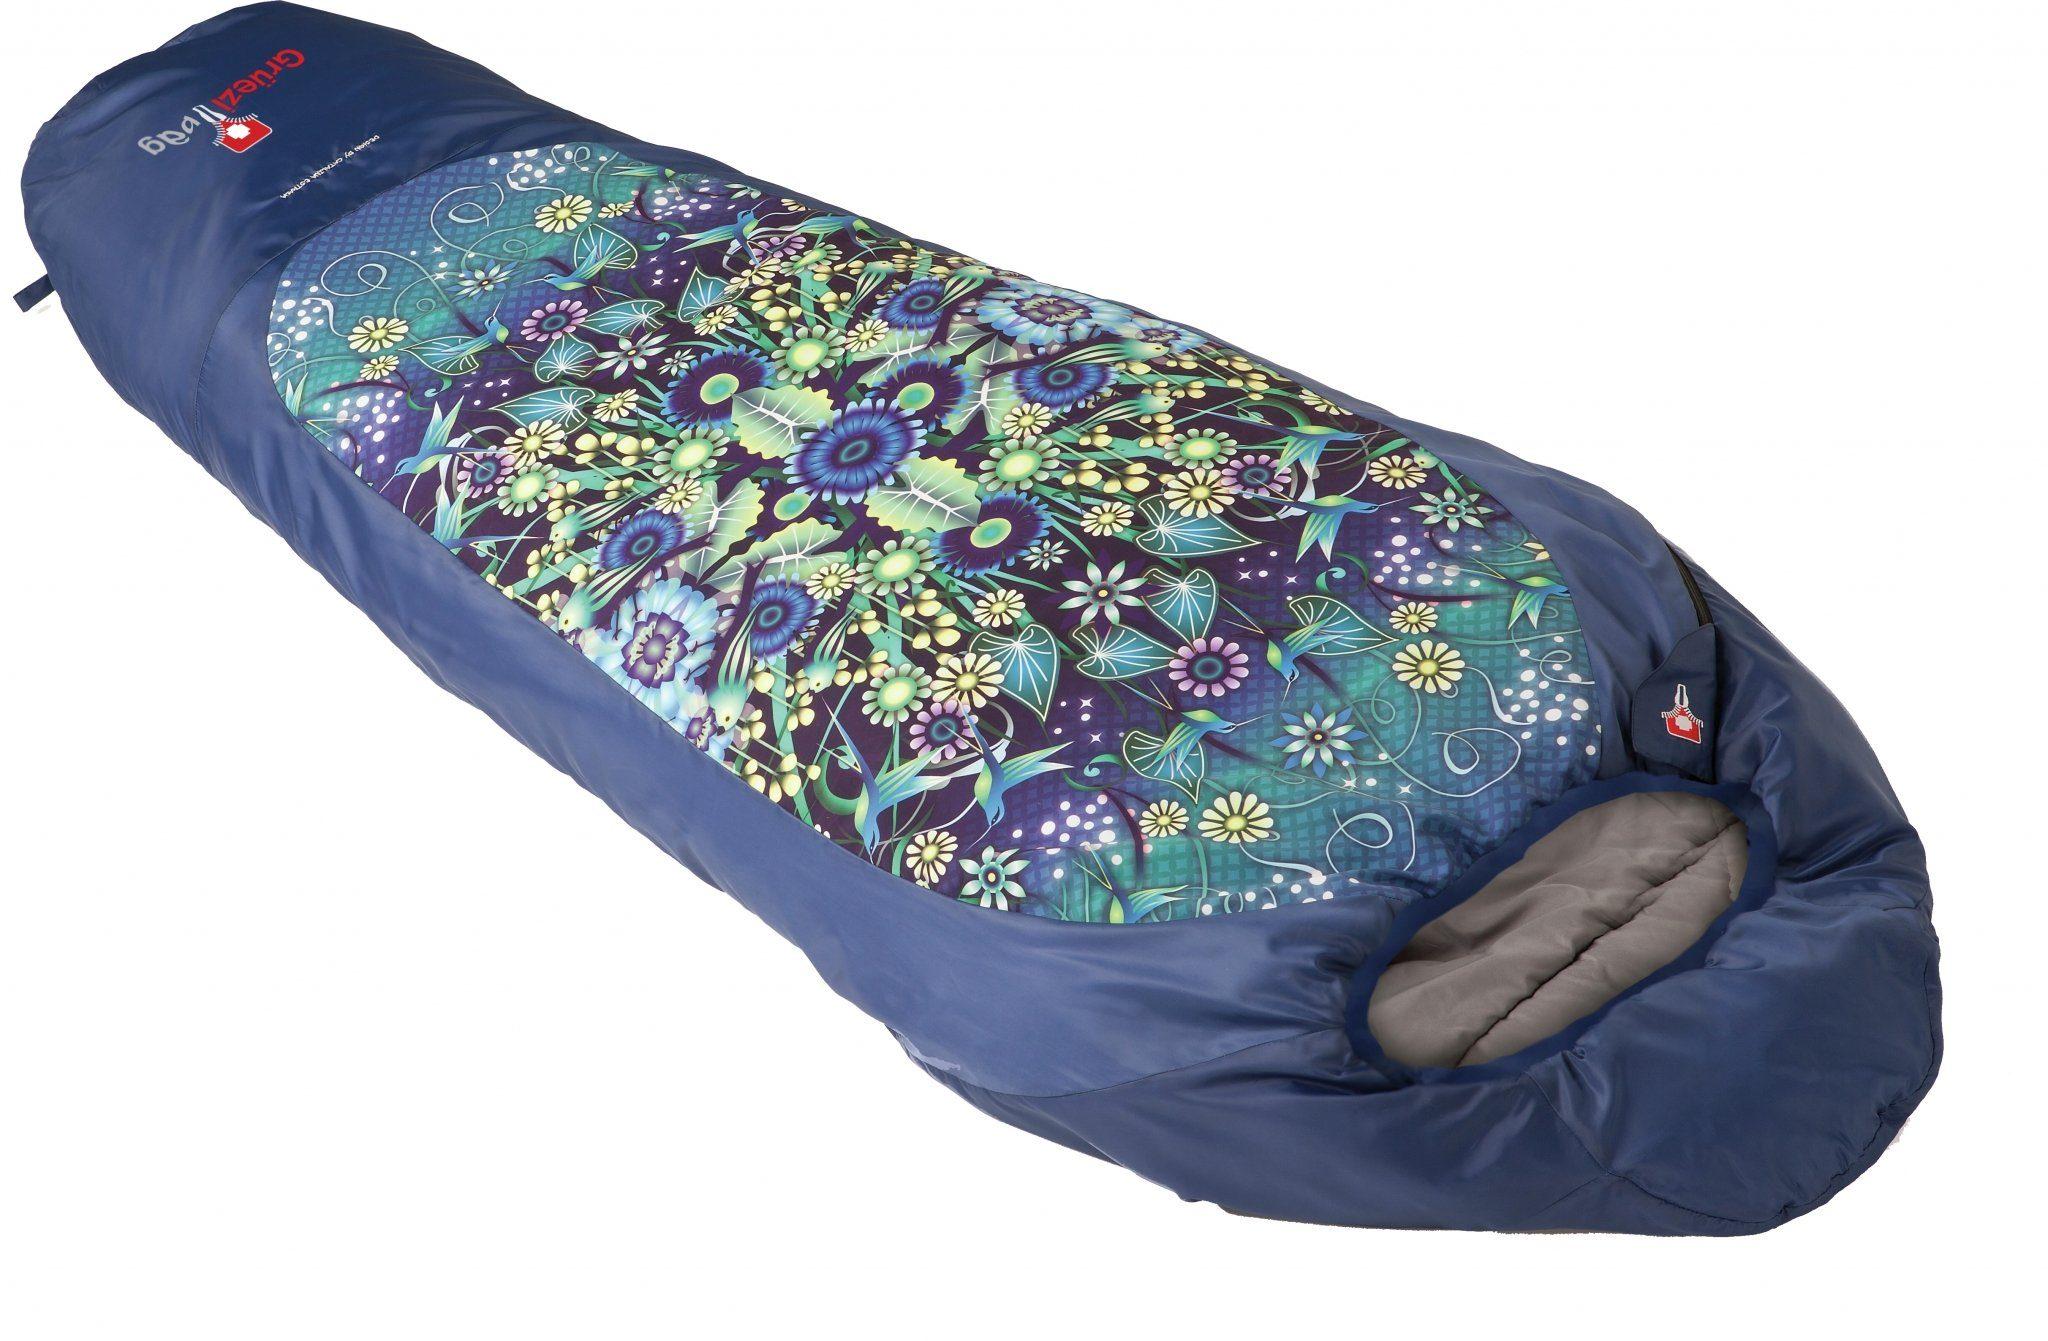 Grüezi-Bag Schlafsack »Catalina Schlafsack«